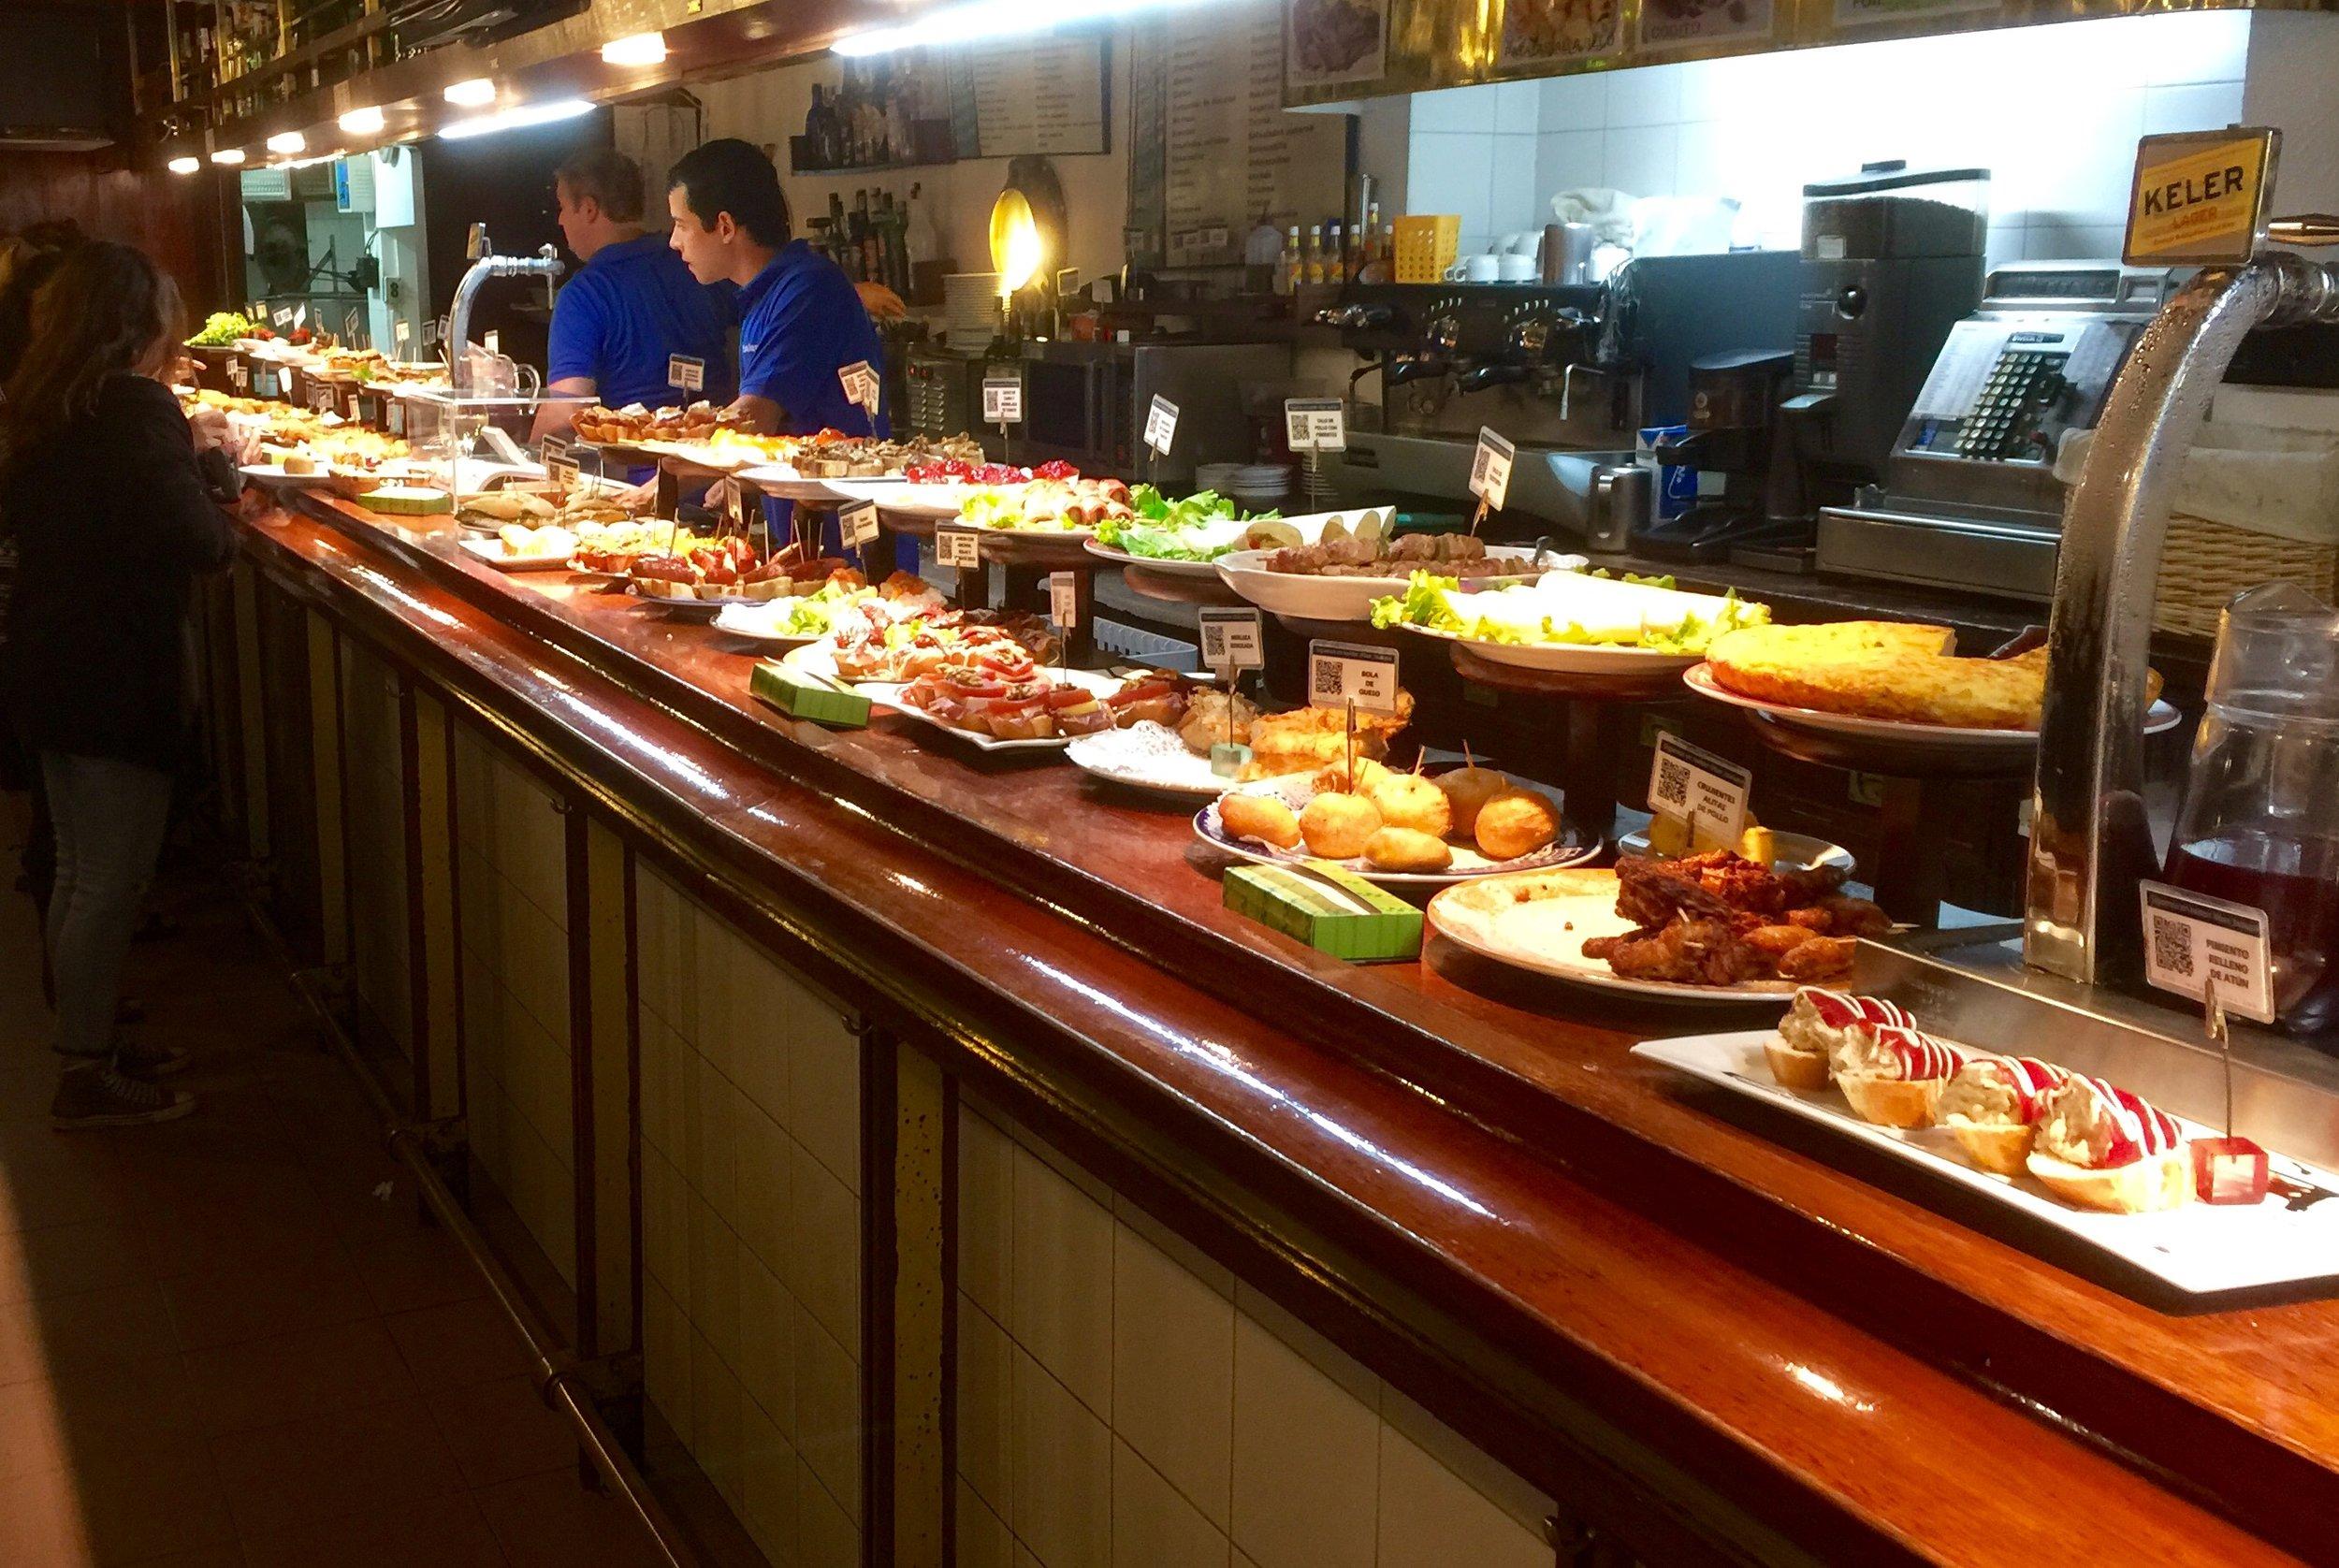 Typical pintxos bar in San Sebastian.